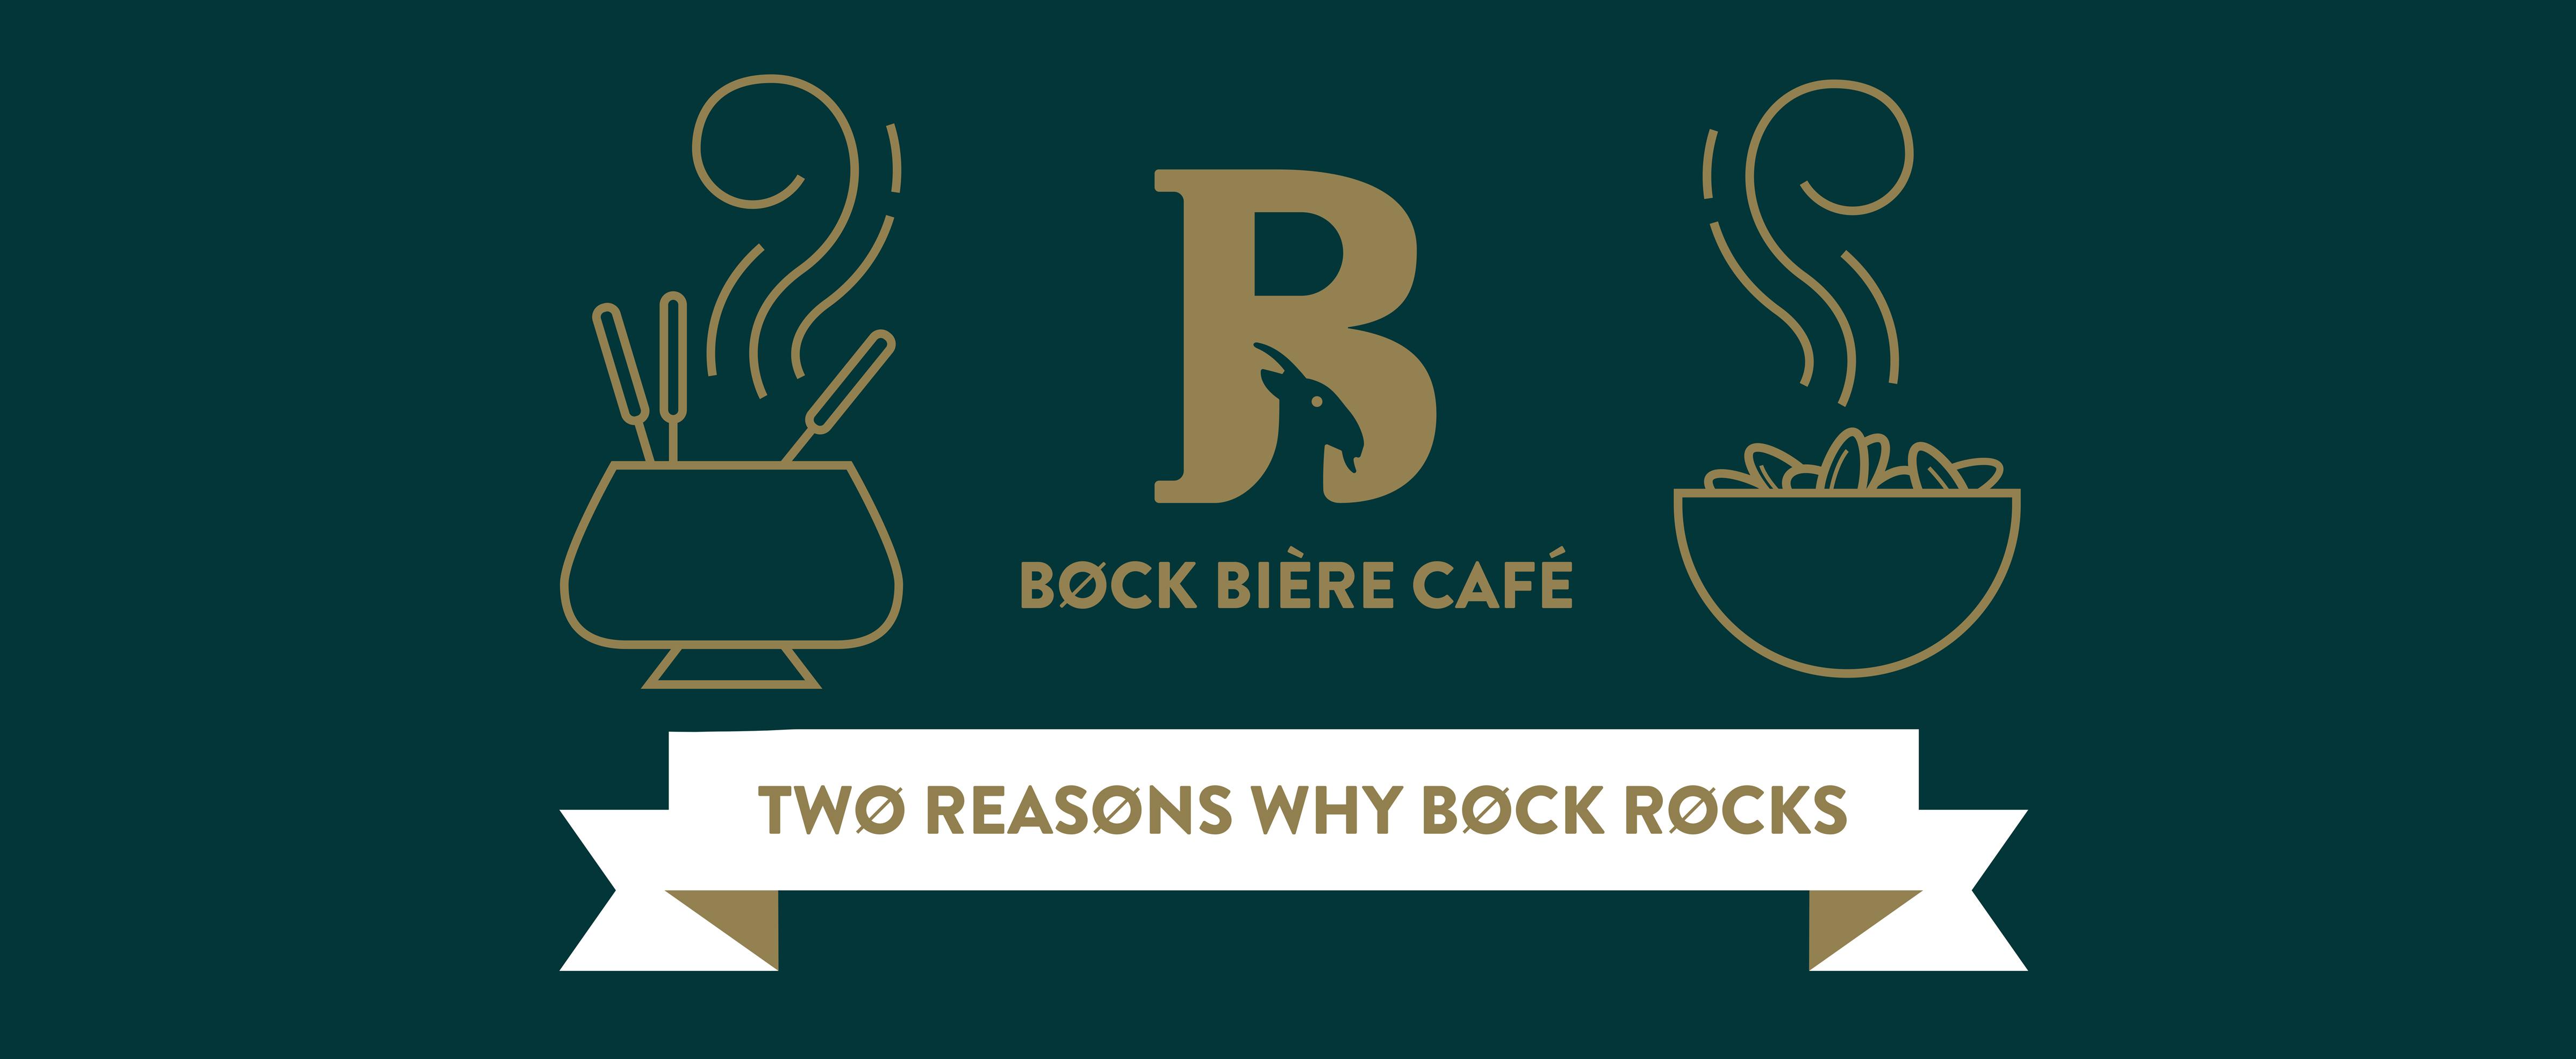 20180302 Bockrocks